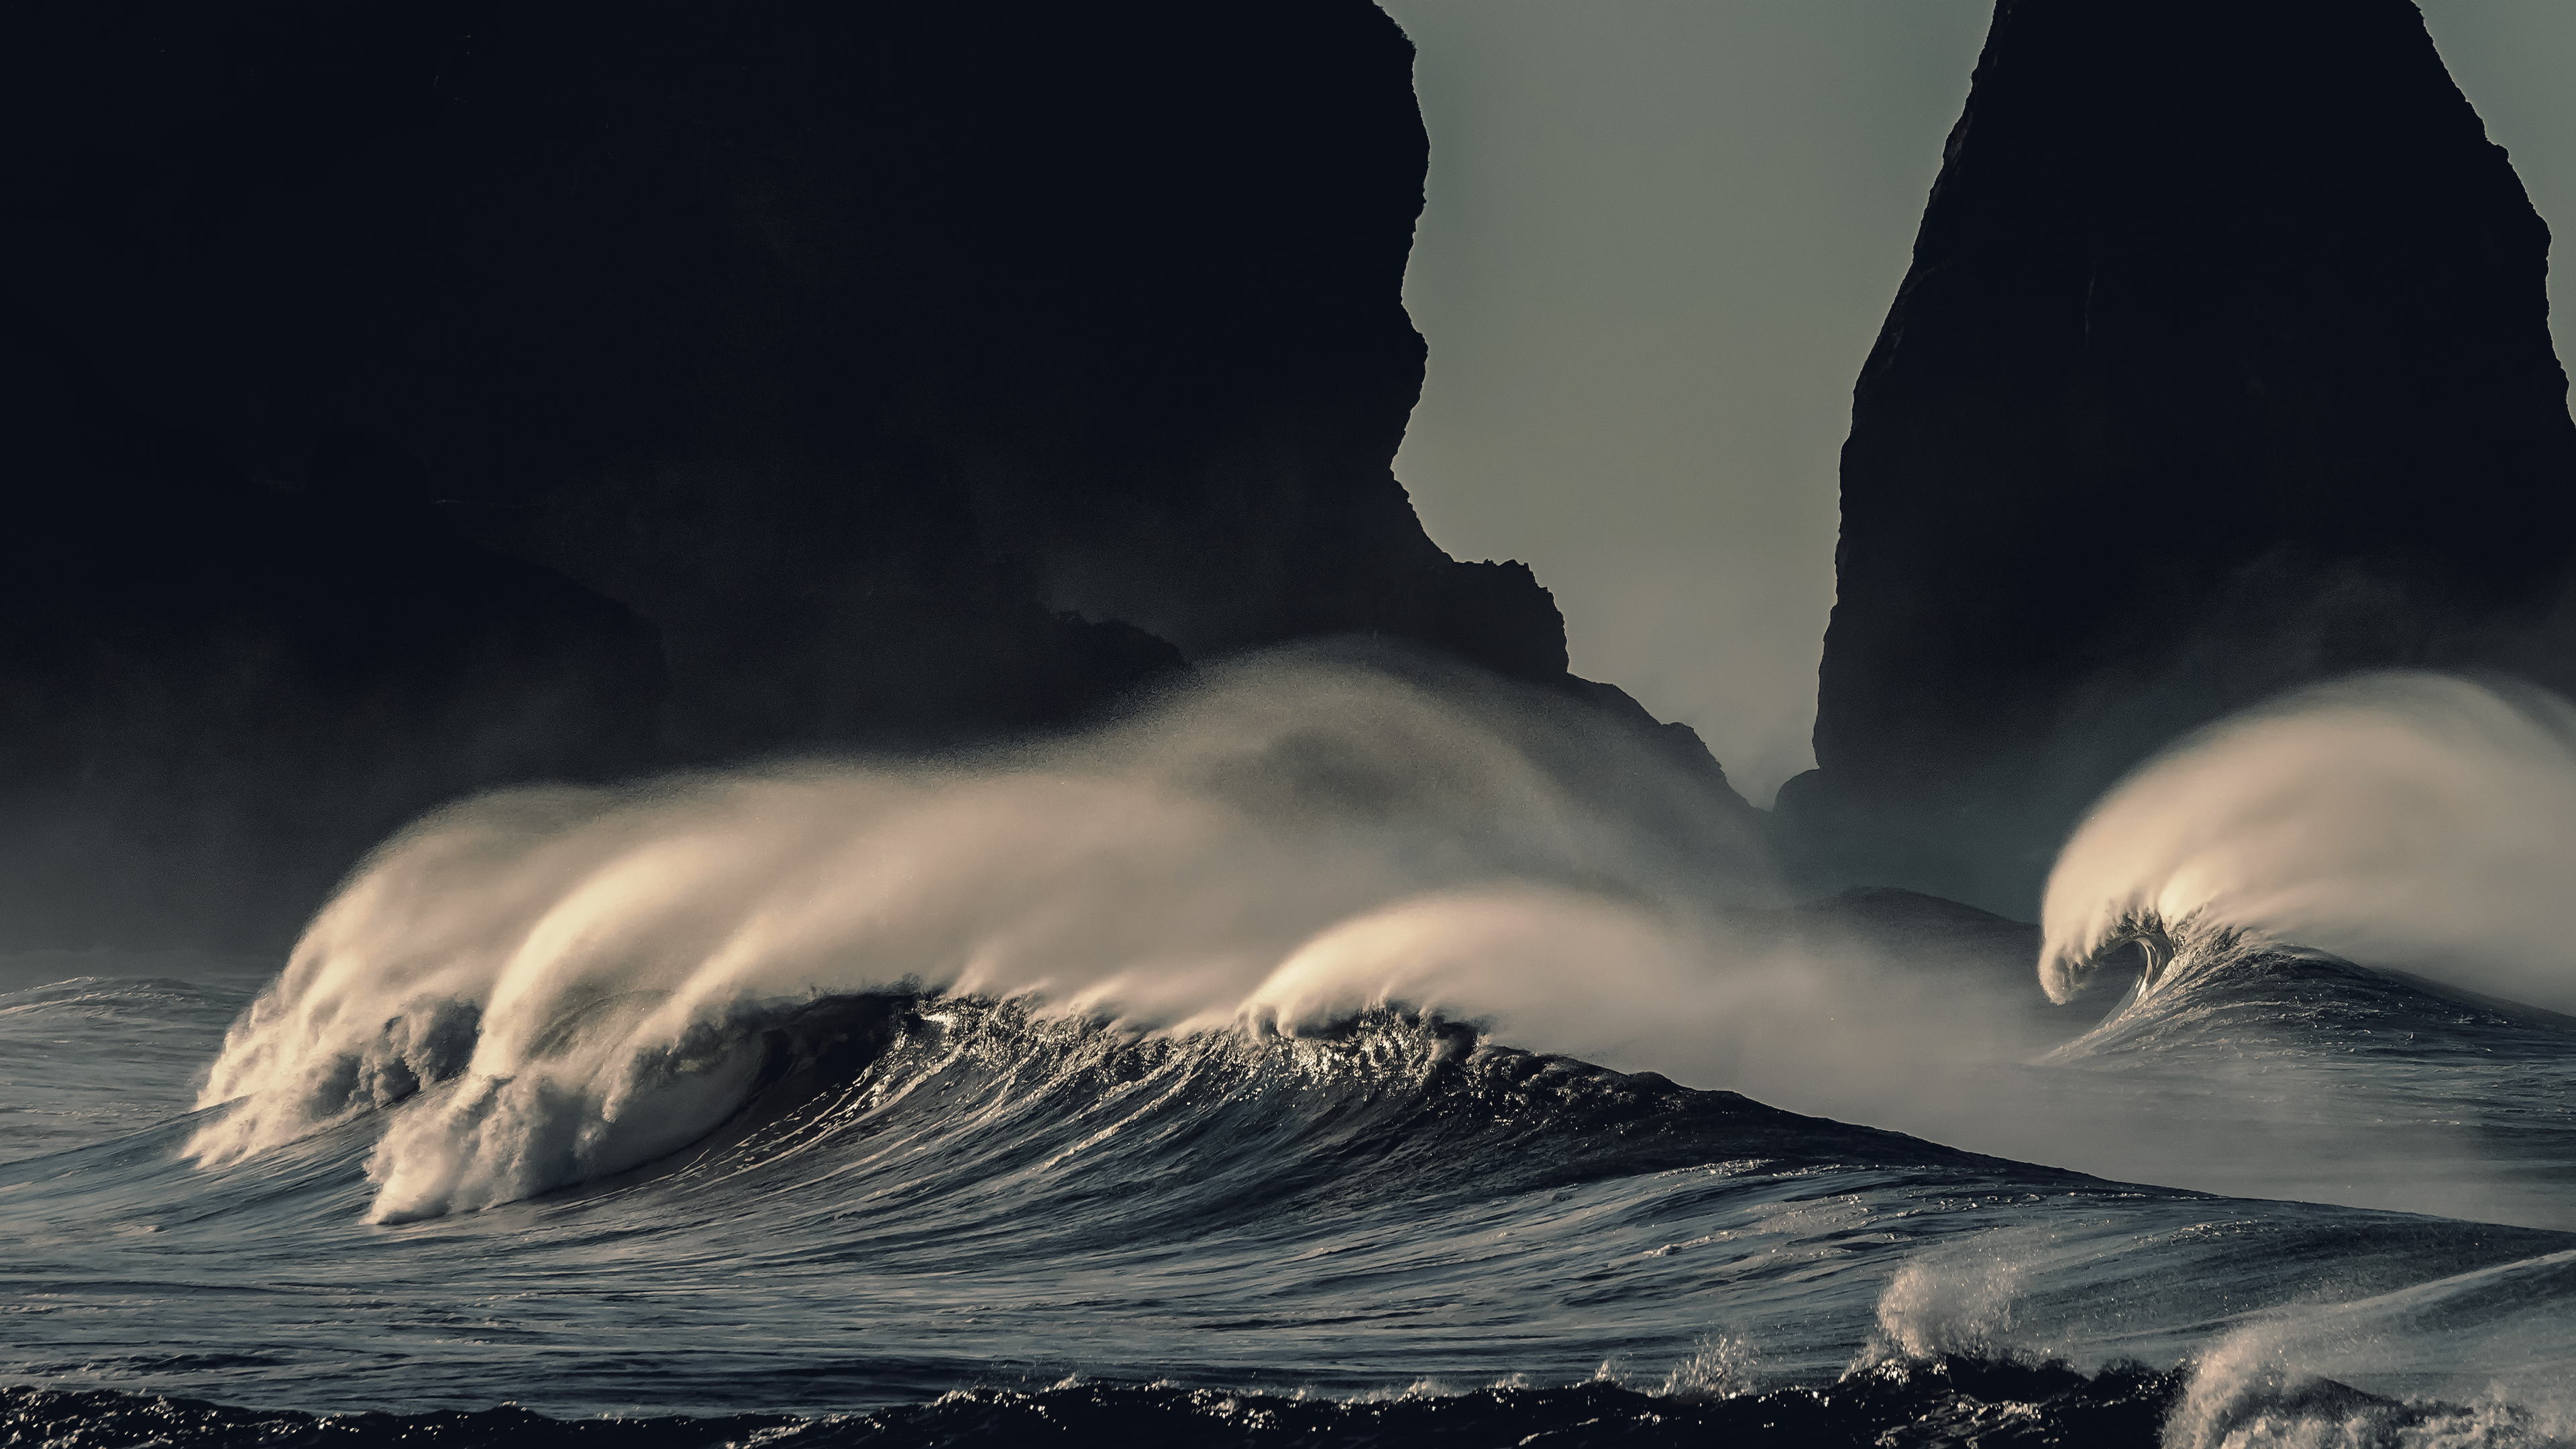 4k Stormy Waves Wallpaper Hd